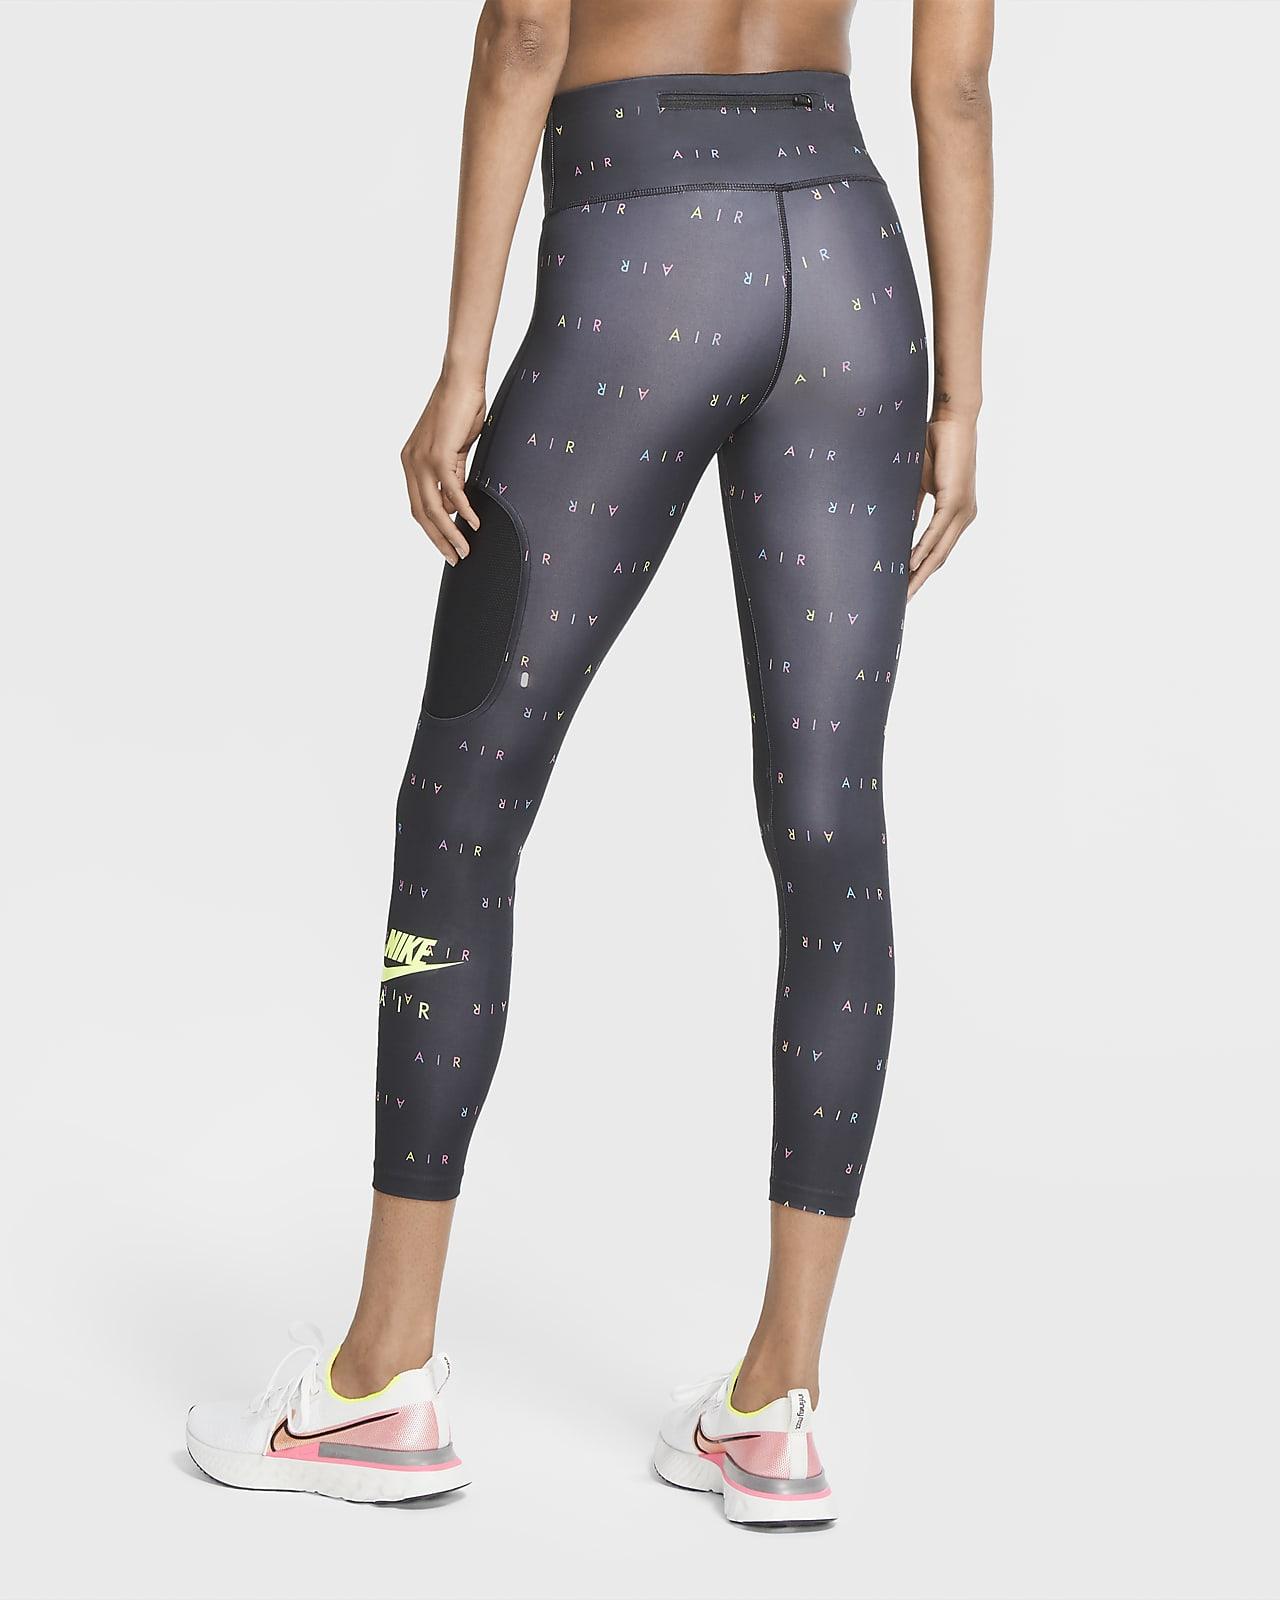 carta perdí mi camino mañana  Mallas de running de 7/8 para mujer Nike Air. Nike.com